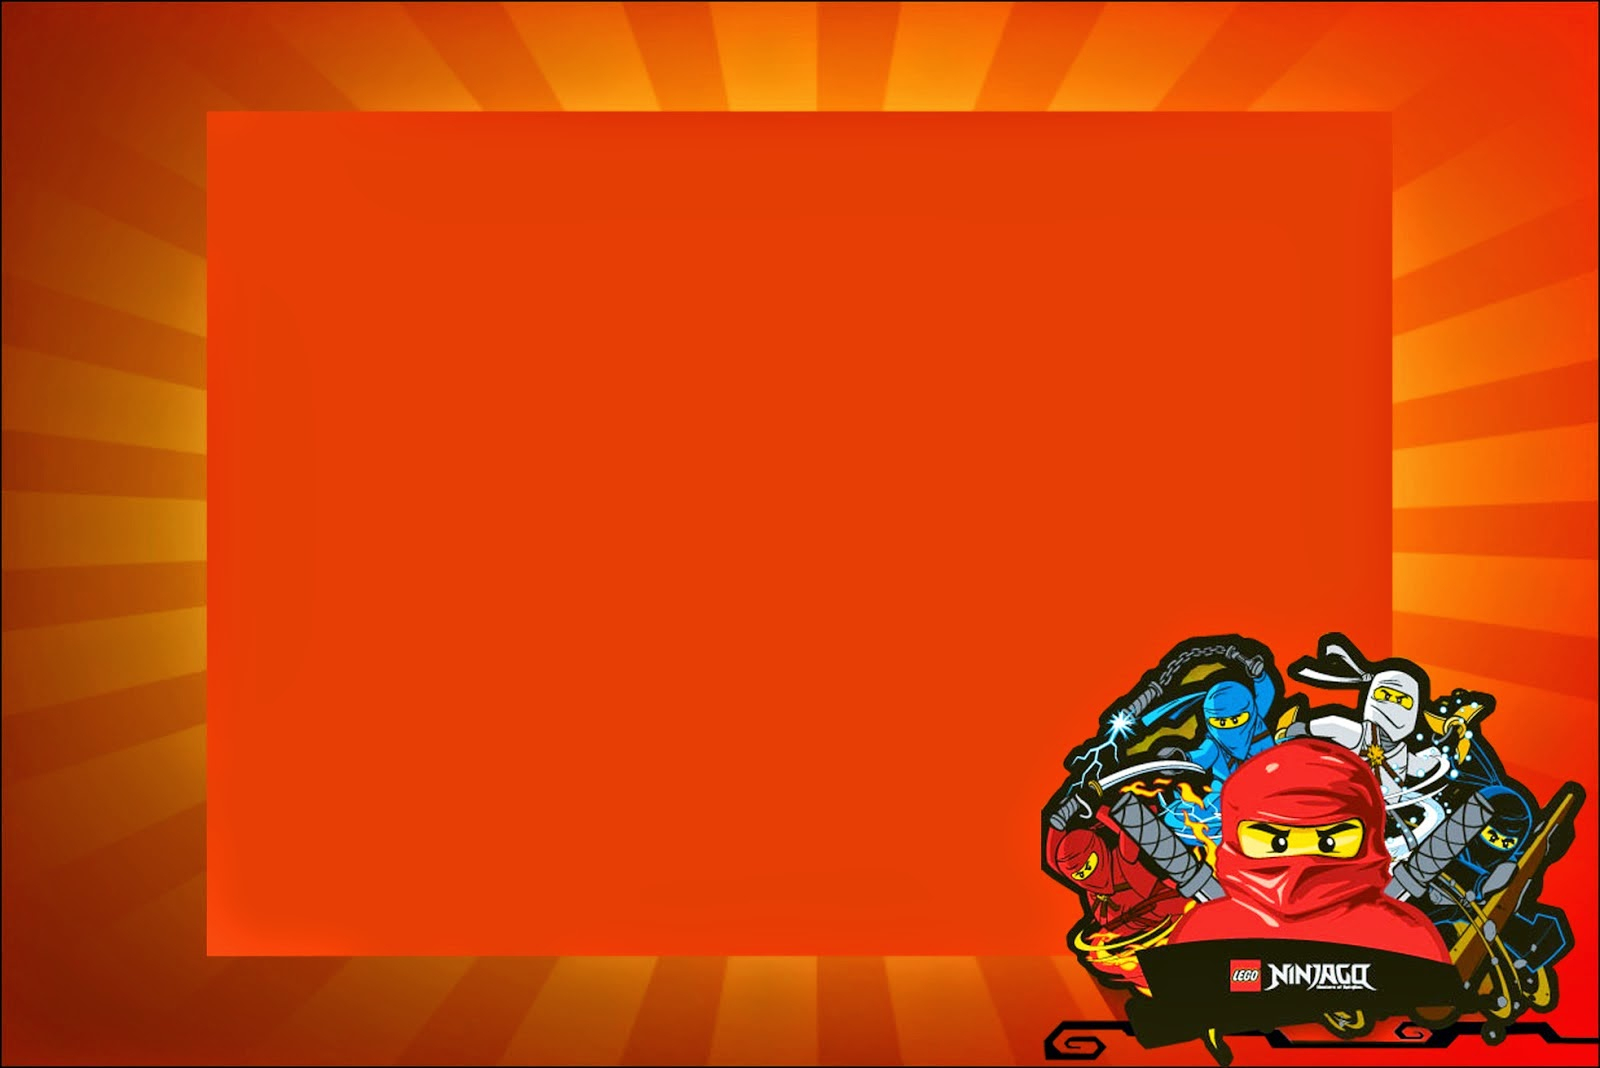 Ninjago: Free Printable Invitations. - Oh My Fiesta! For Geeks - Lego Ninjago Party Invitations Printable Free